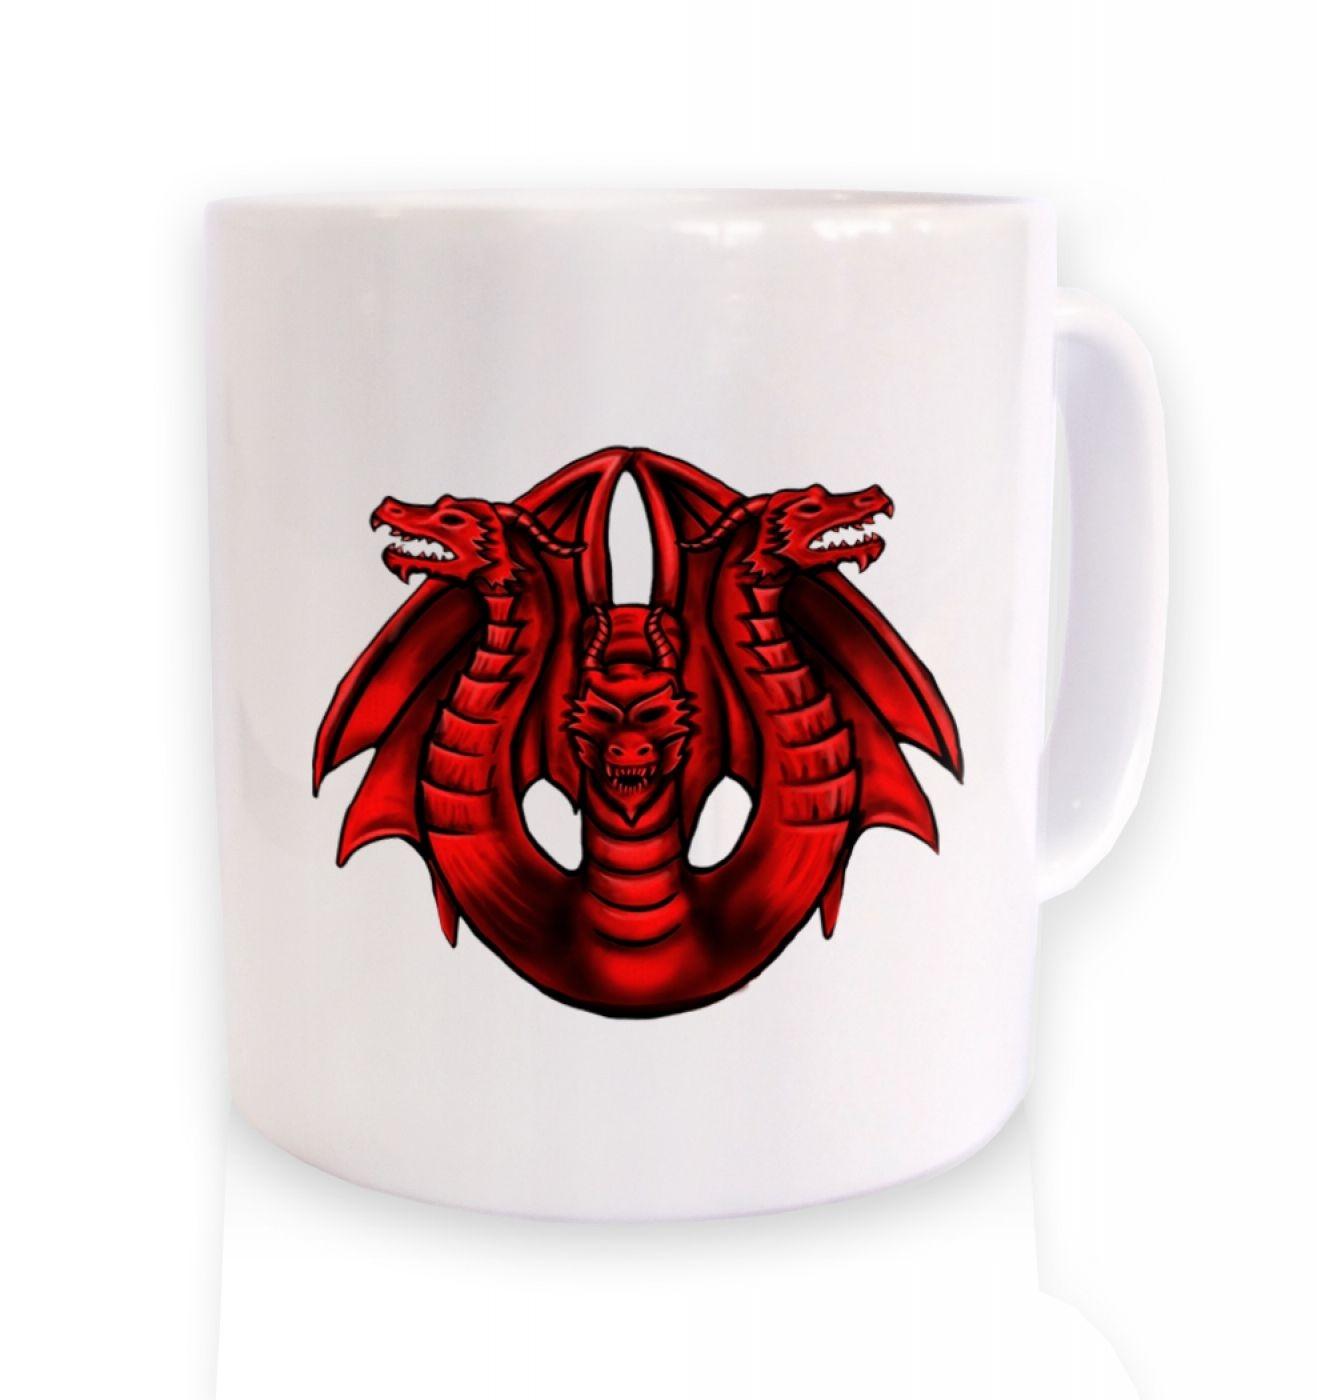 Three Headed Dragon ceramic coffee mug